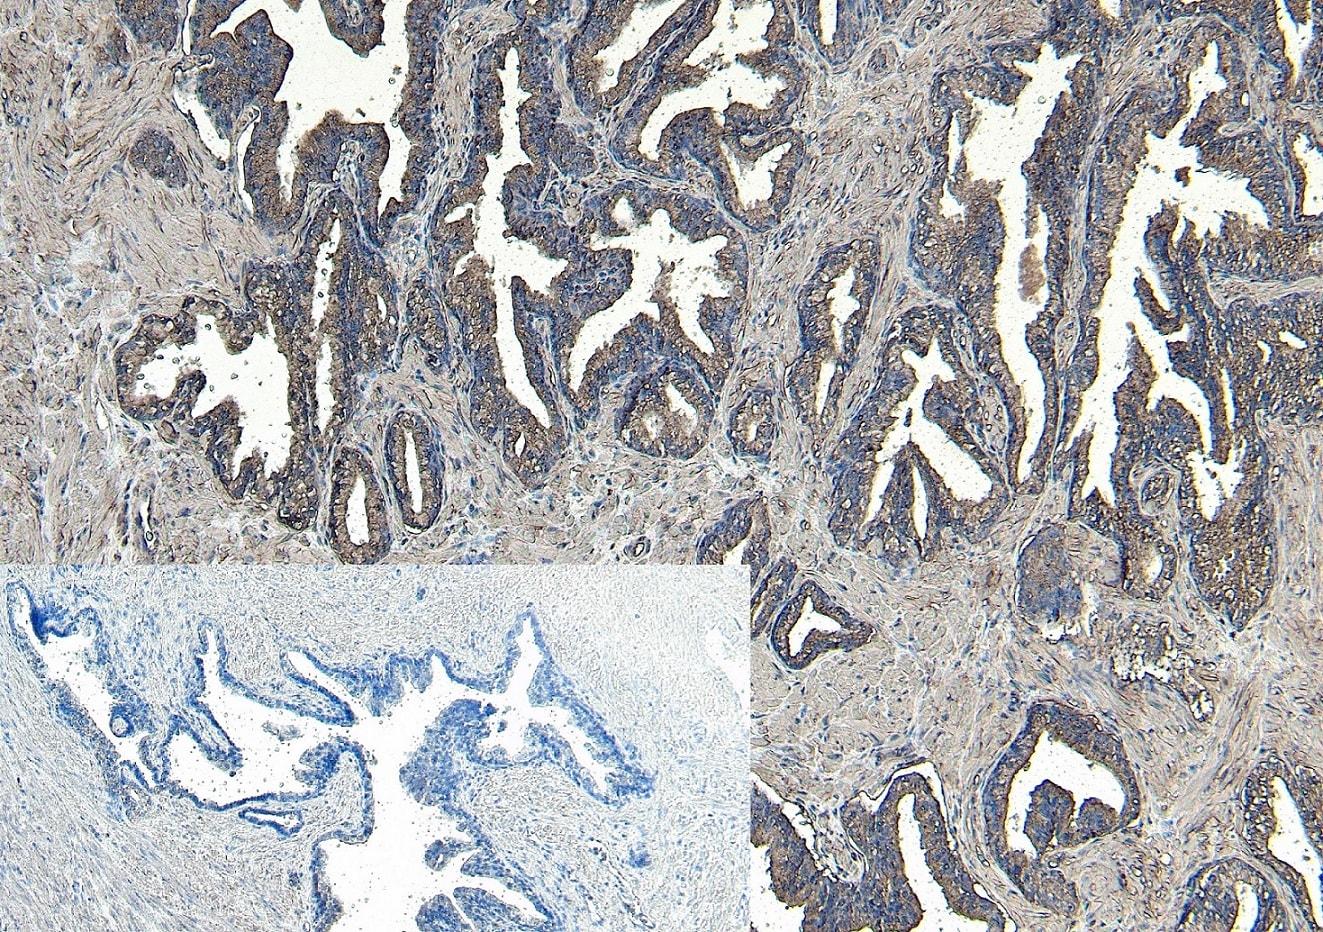 Immunohistochemistry (Formalin/PFA-fixed paraffin-embedded sections) - Anti-CEP290 antibody (ab77479)